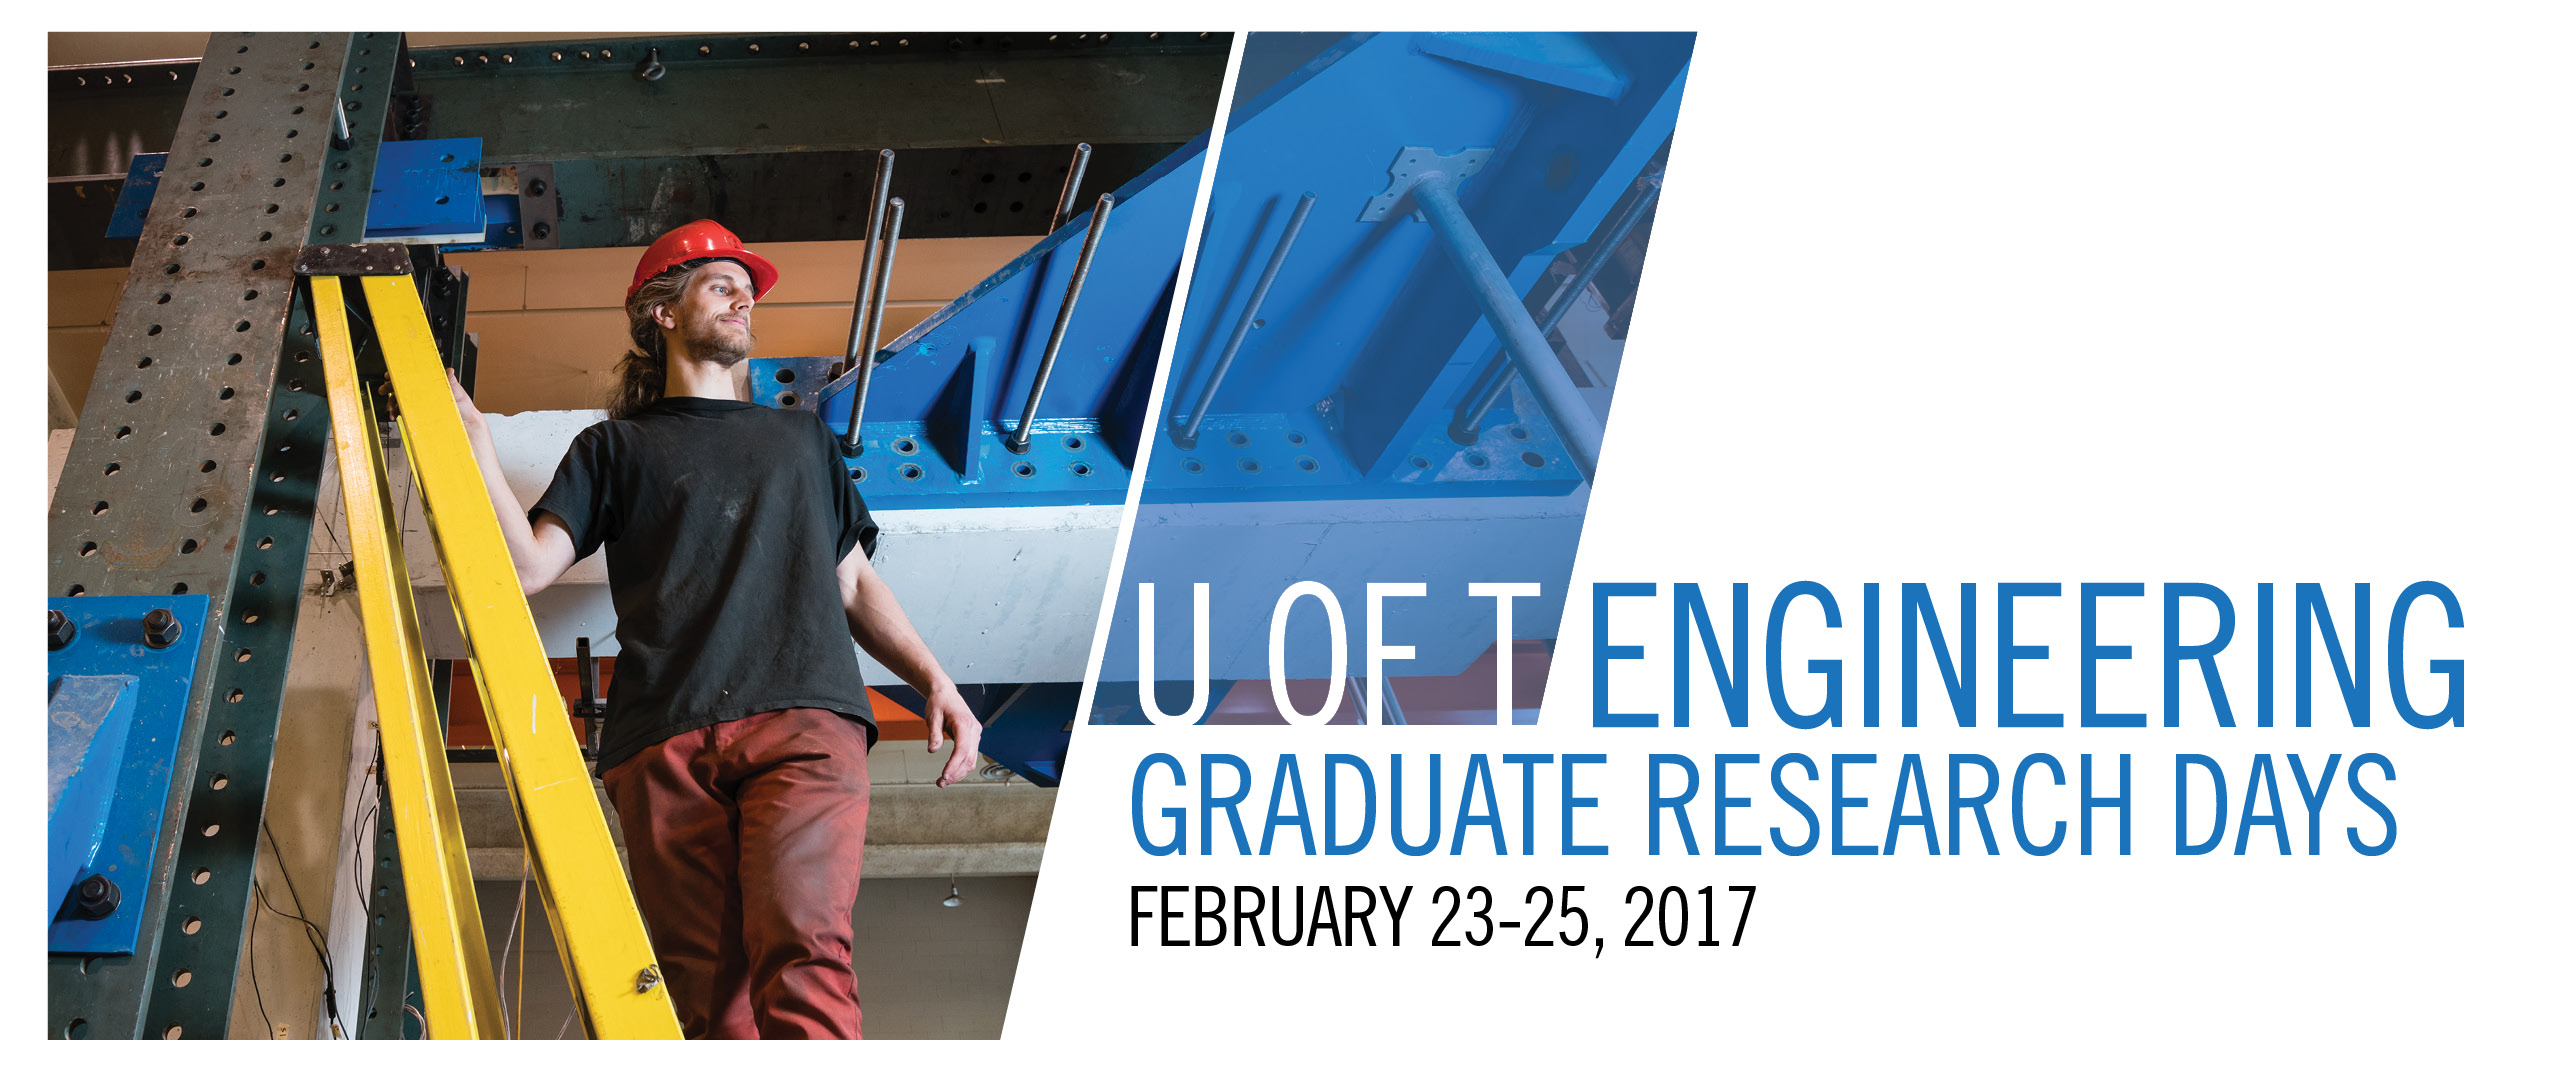 U of T Engineering Graduate Research Days, February 23-25, 2017